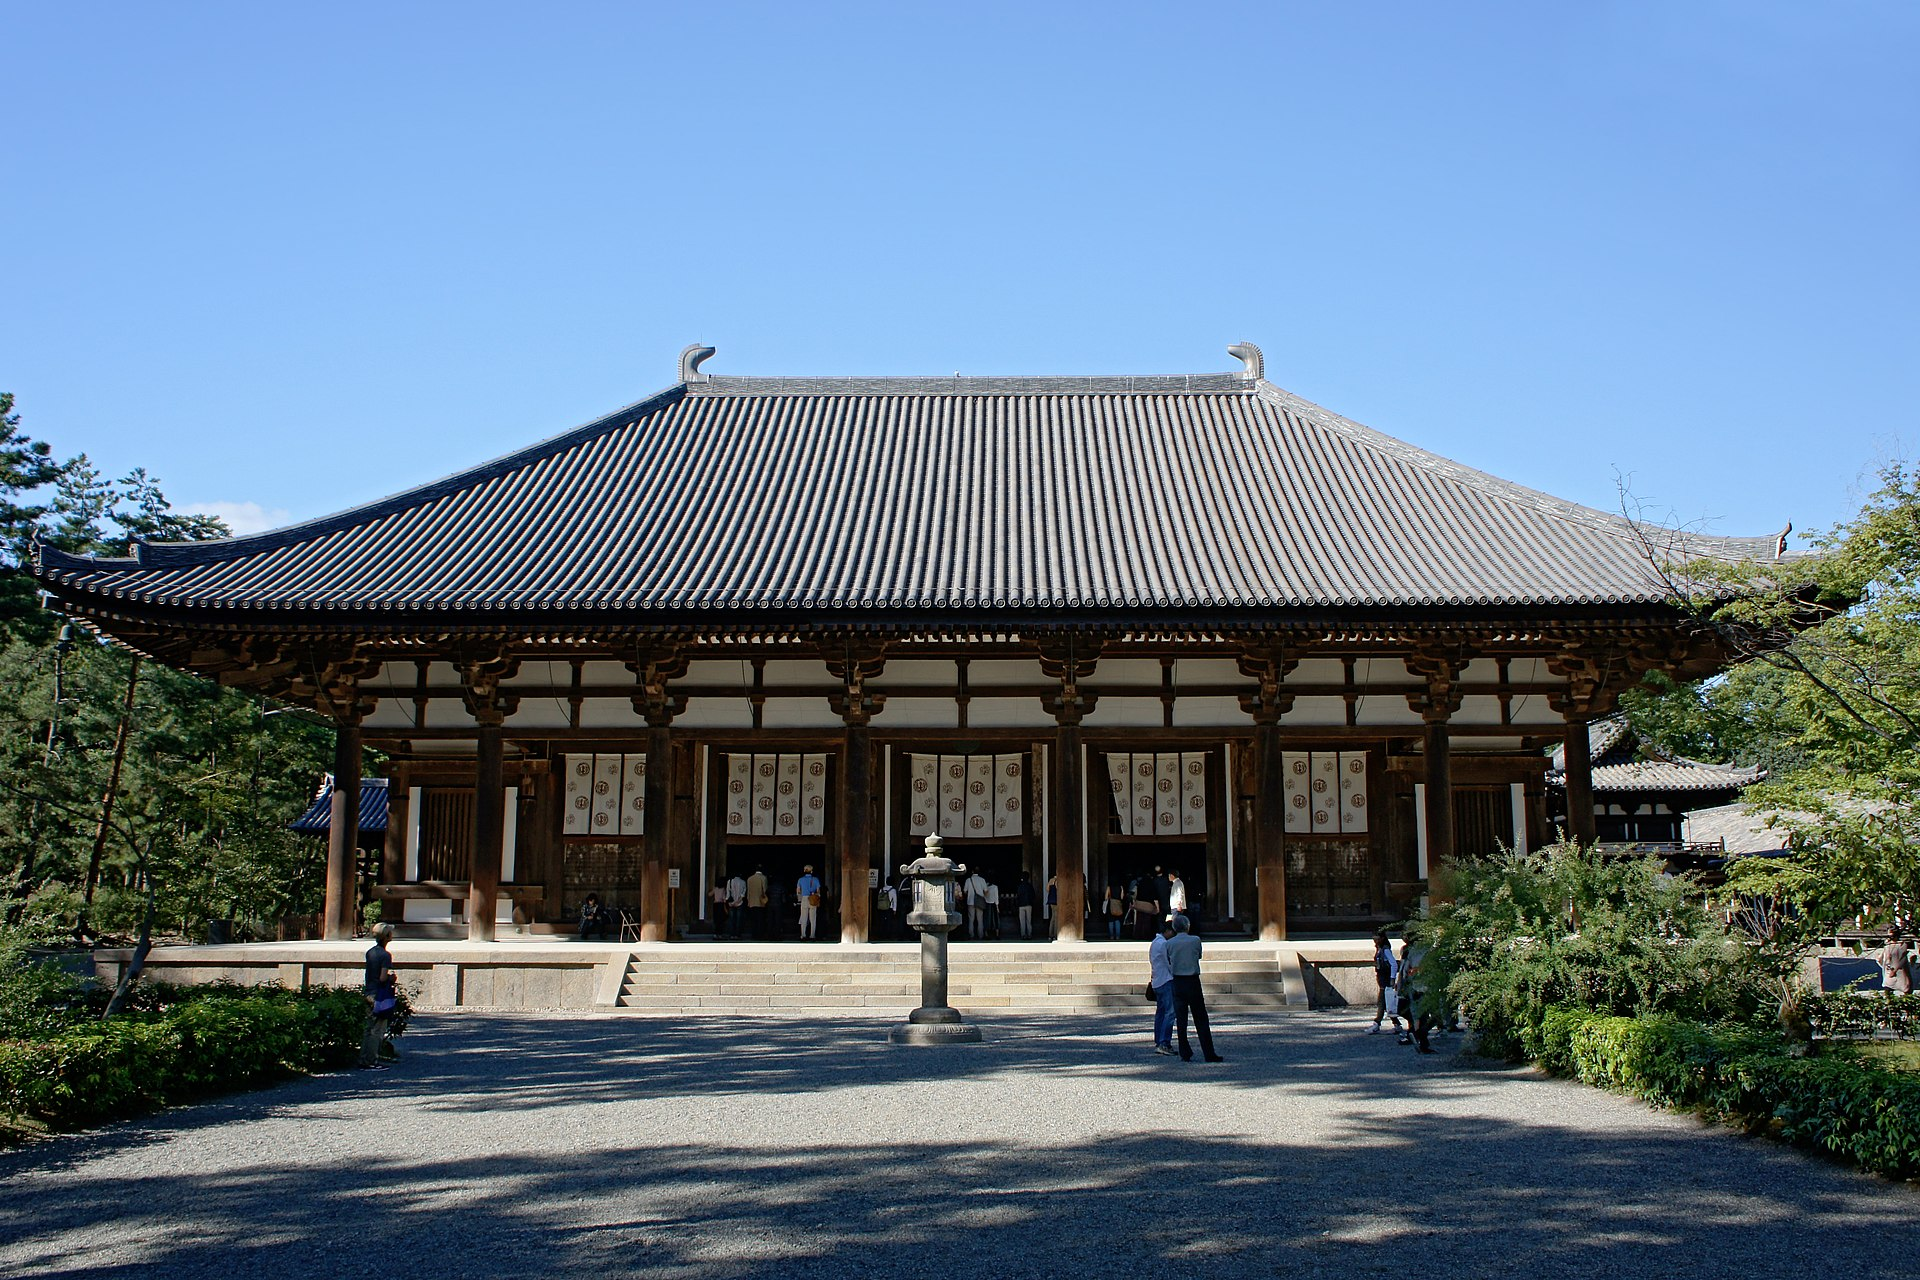 唐招提寺 - Wikipedia